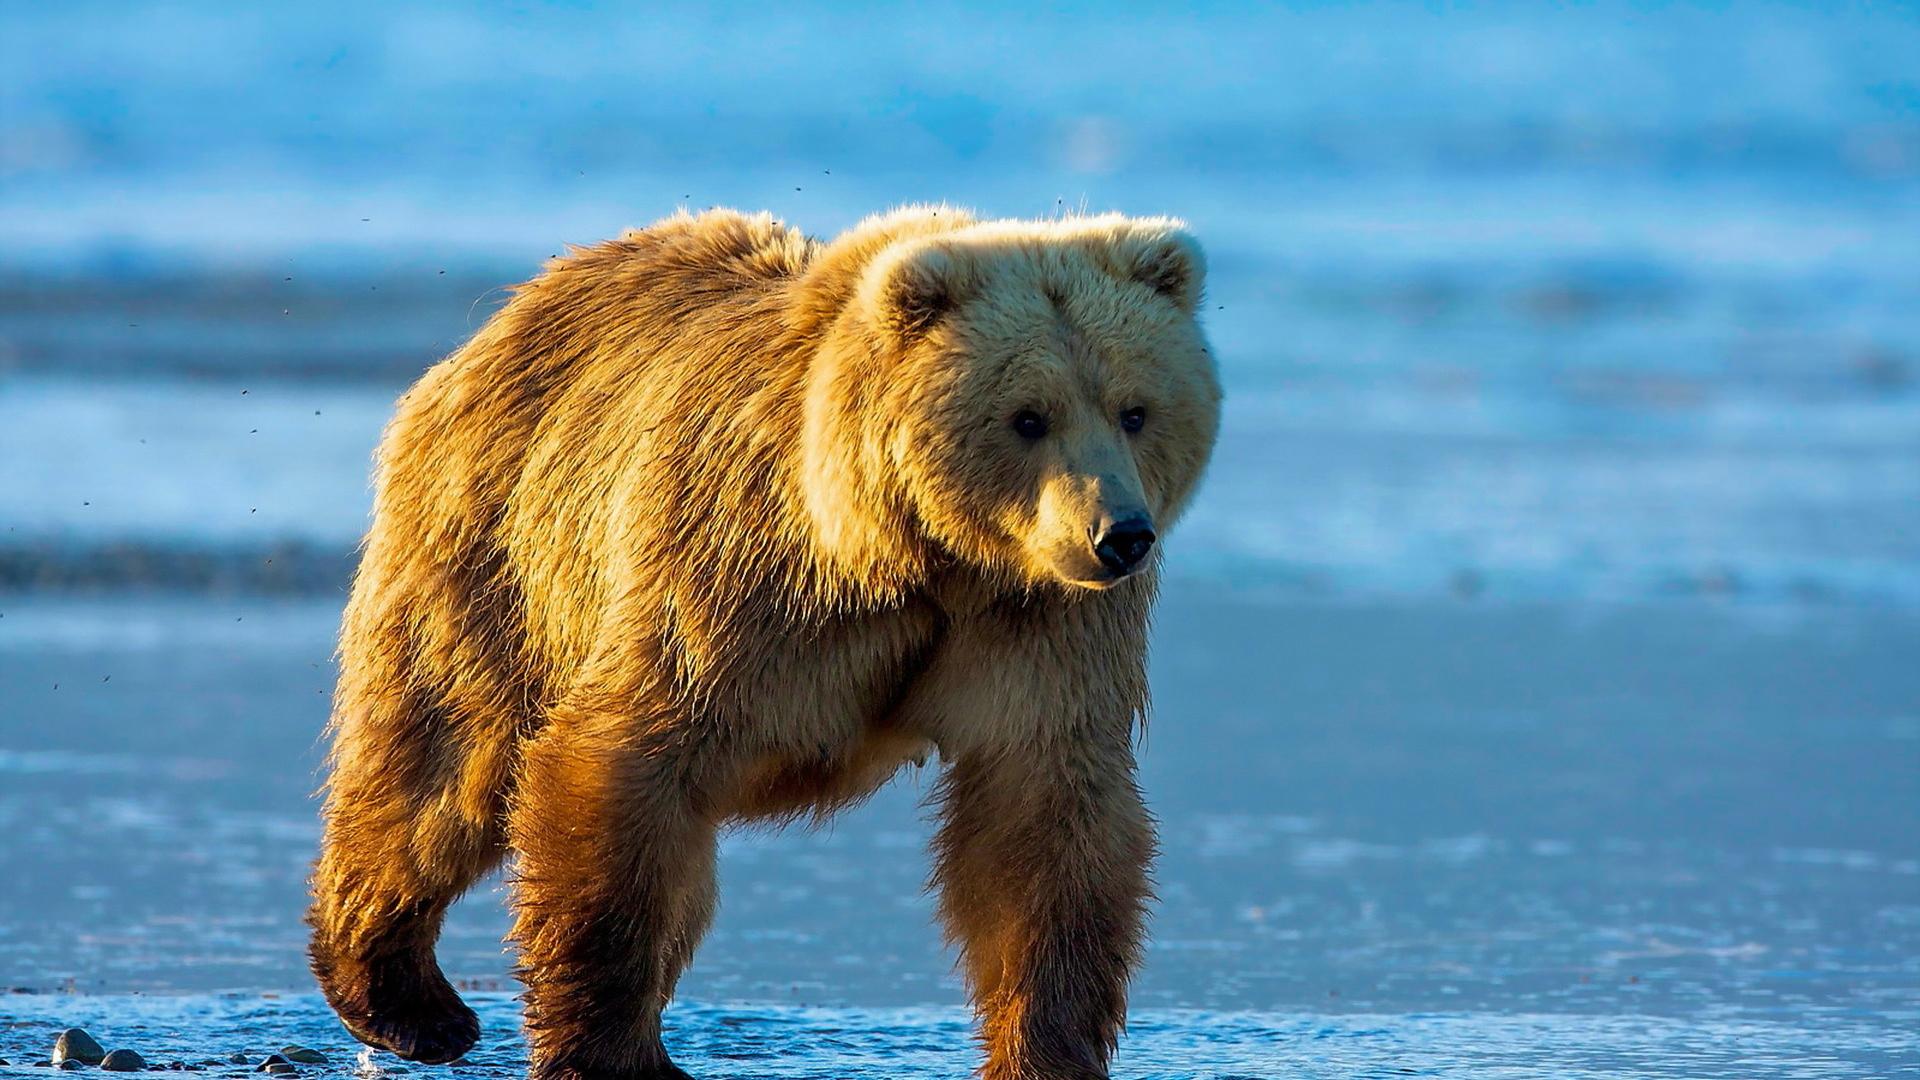 1920x1080 wallpaper Bear, wild animal, furry animal